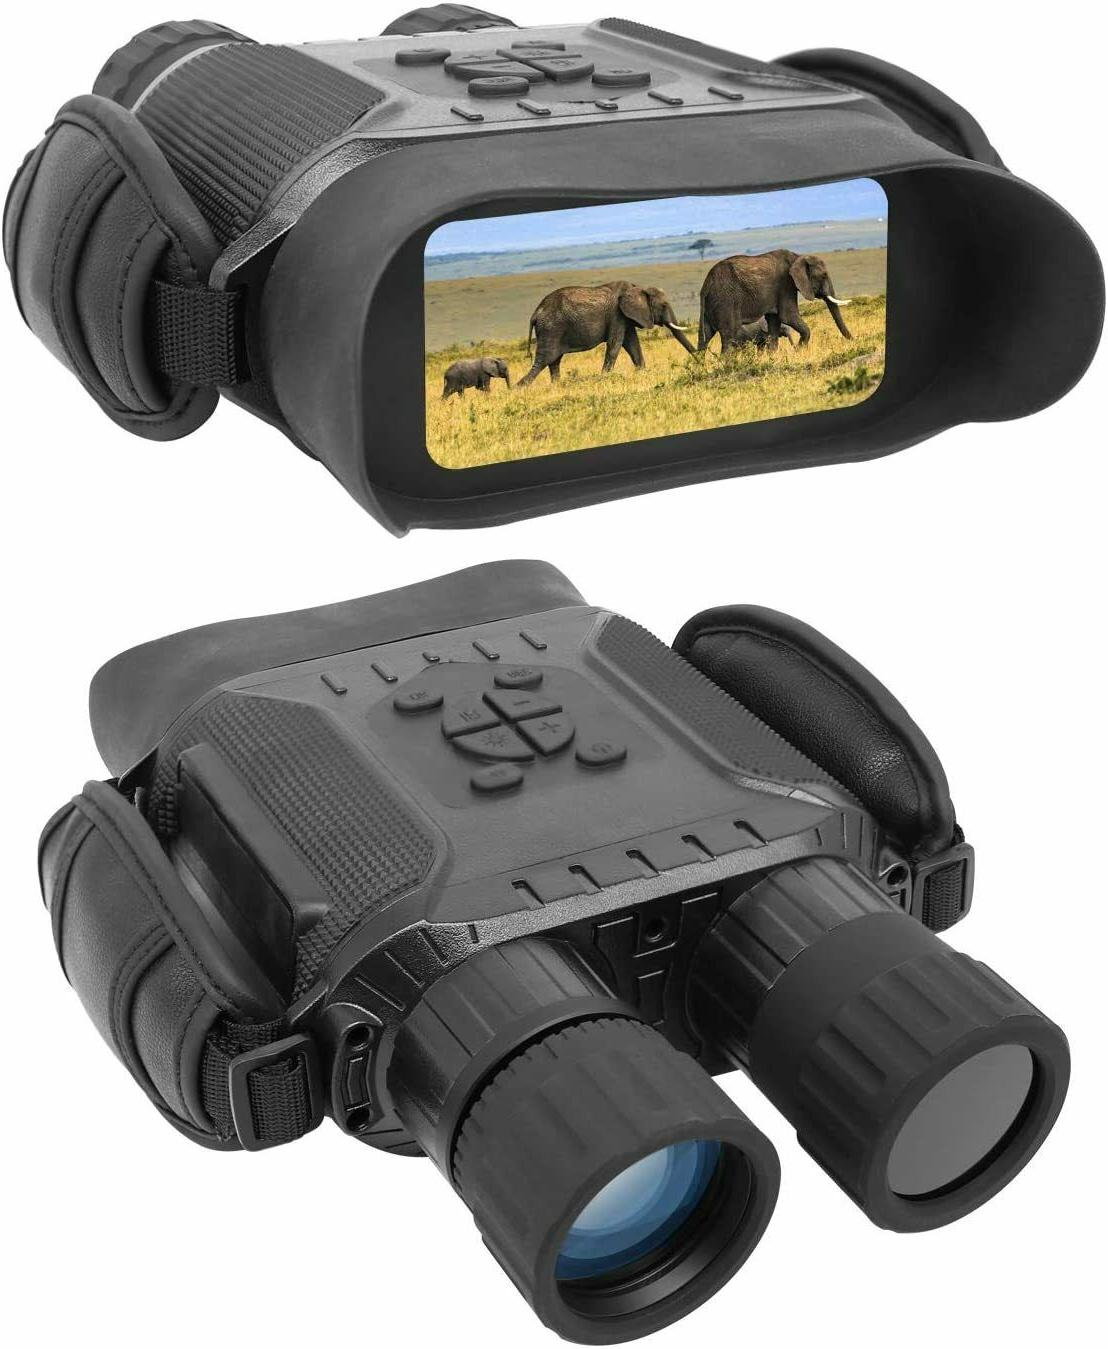 nv 900 digital night vision binocular 4